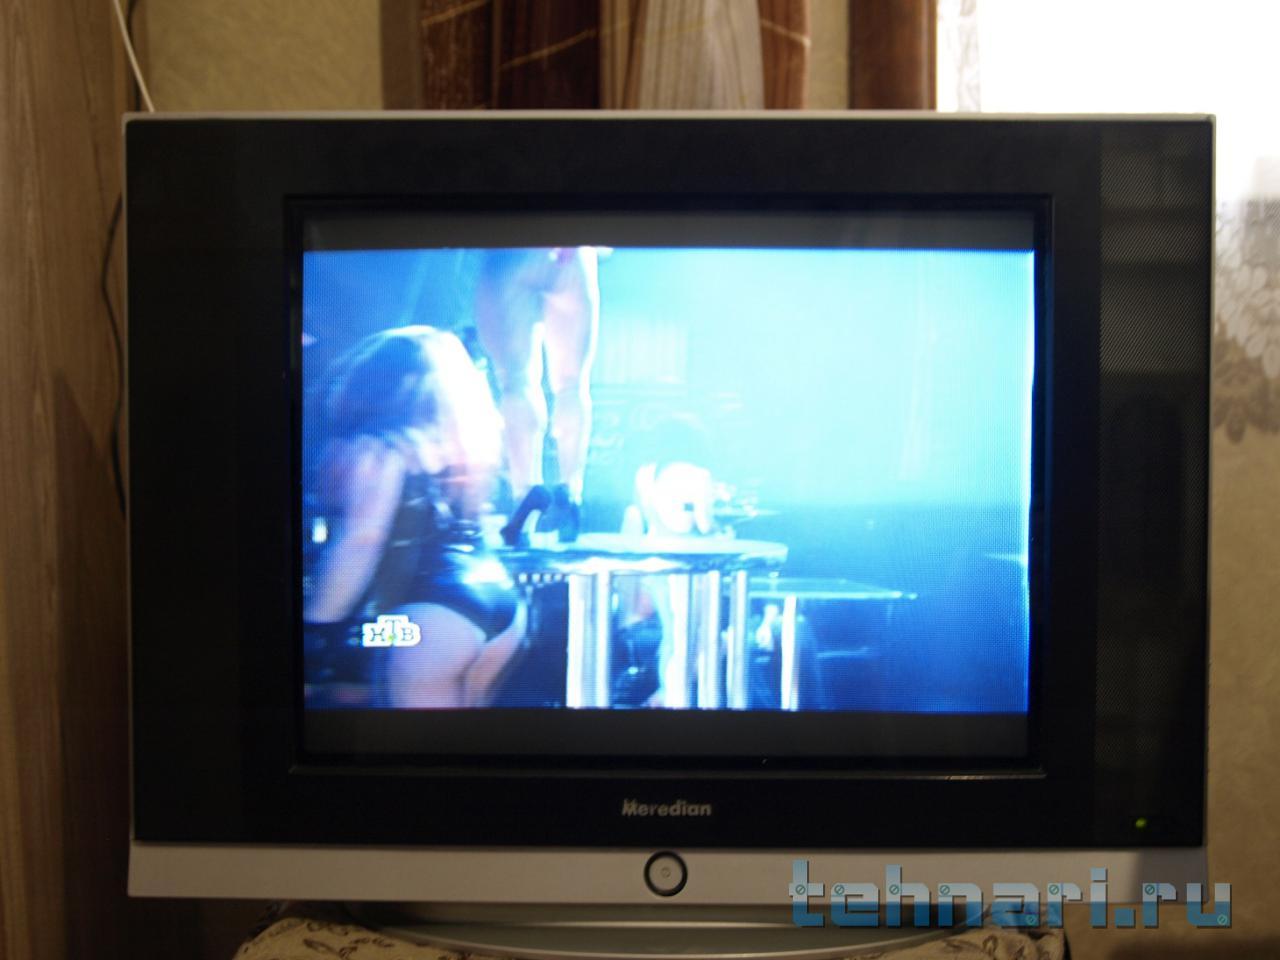 изображение на телевизоре сузилось